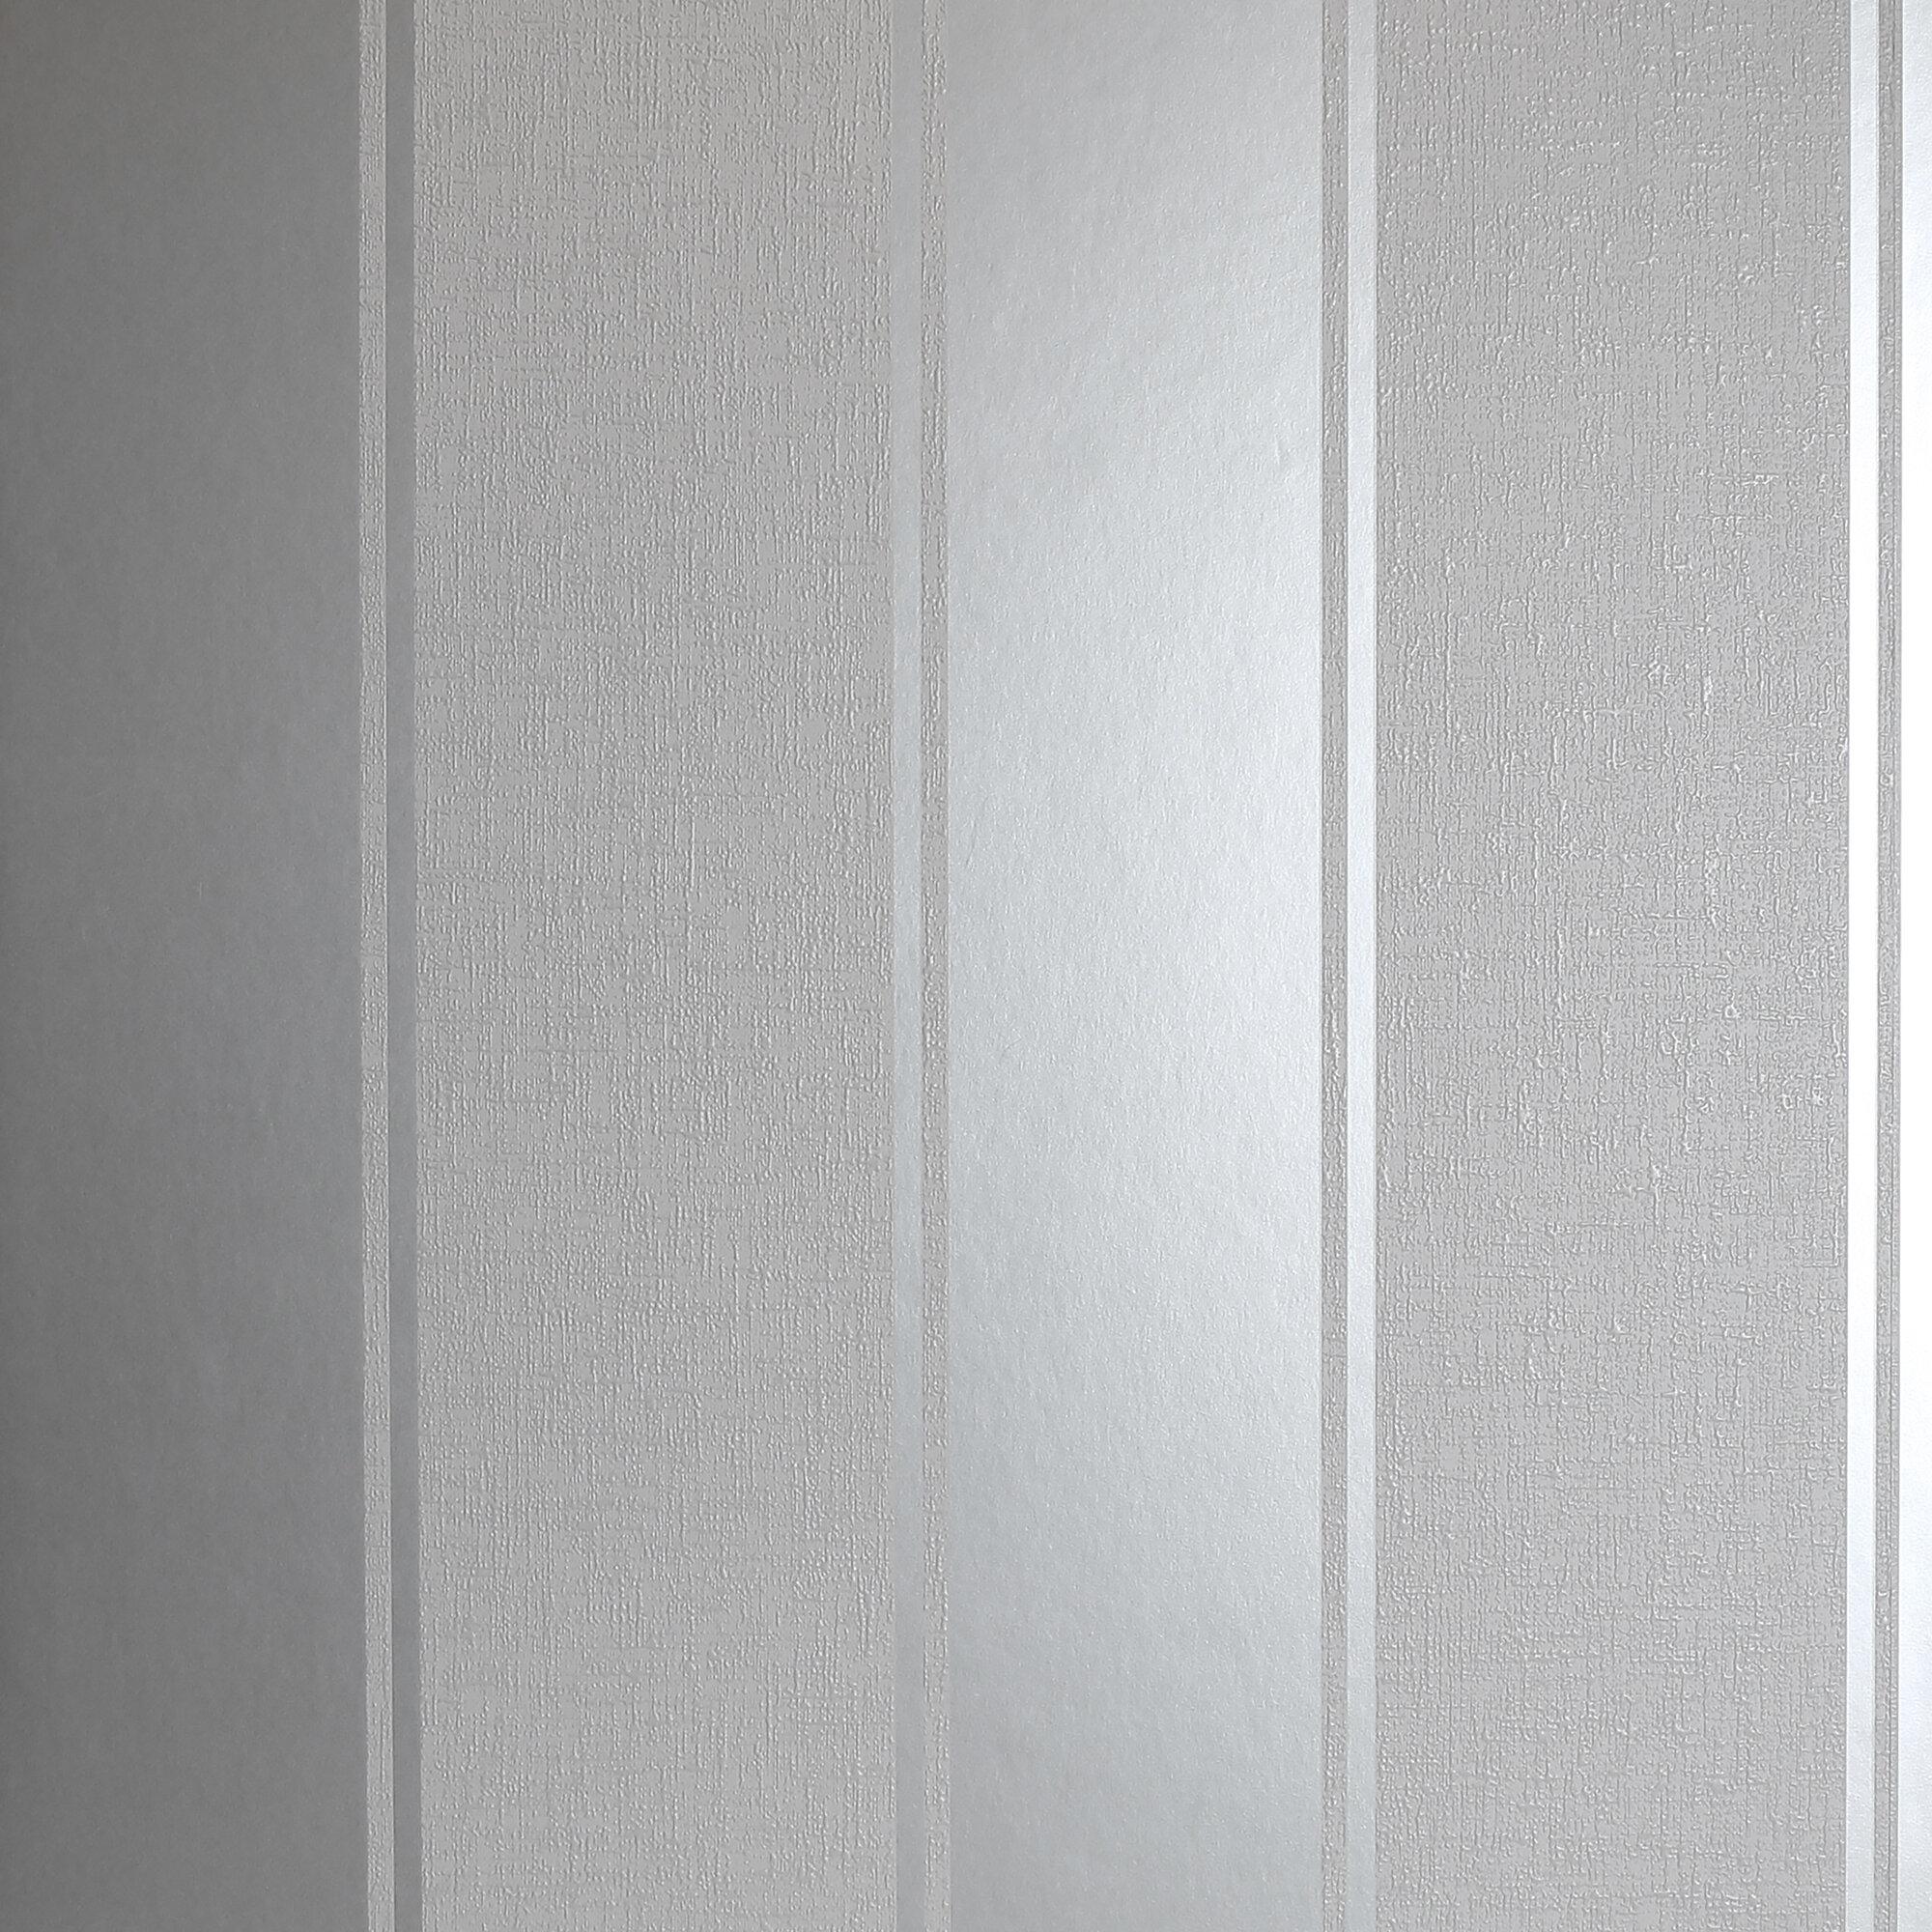 1m X 53cm Matte Metallic Finish Wallpaper Roll